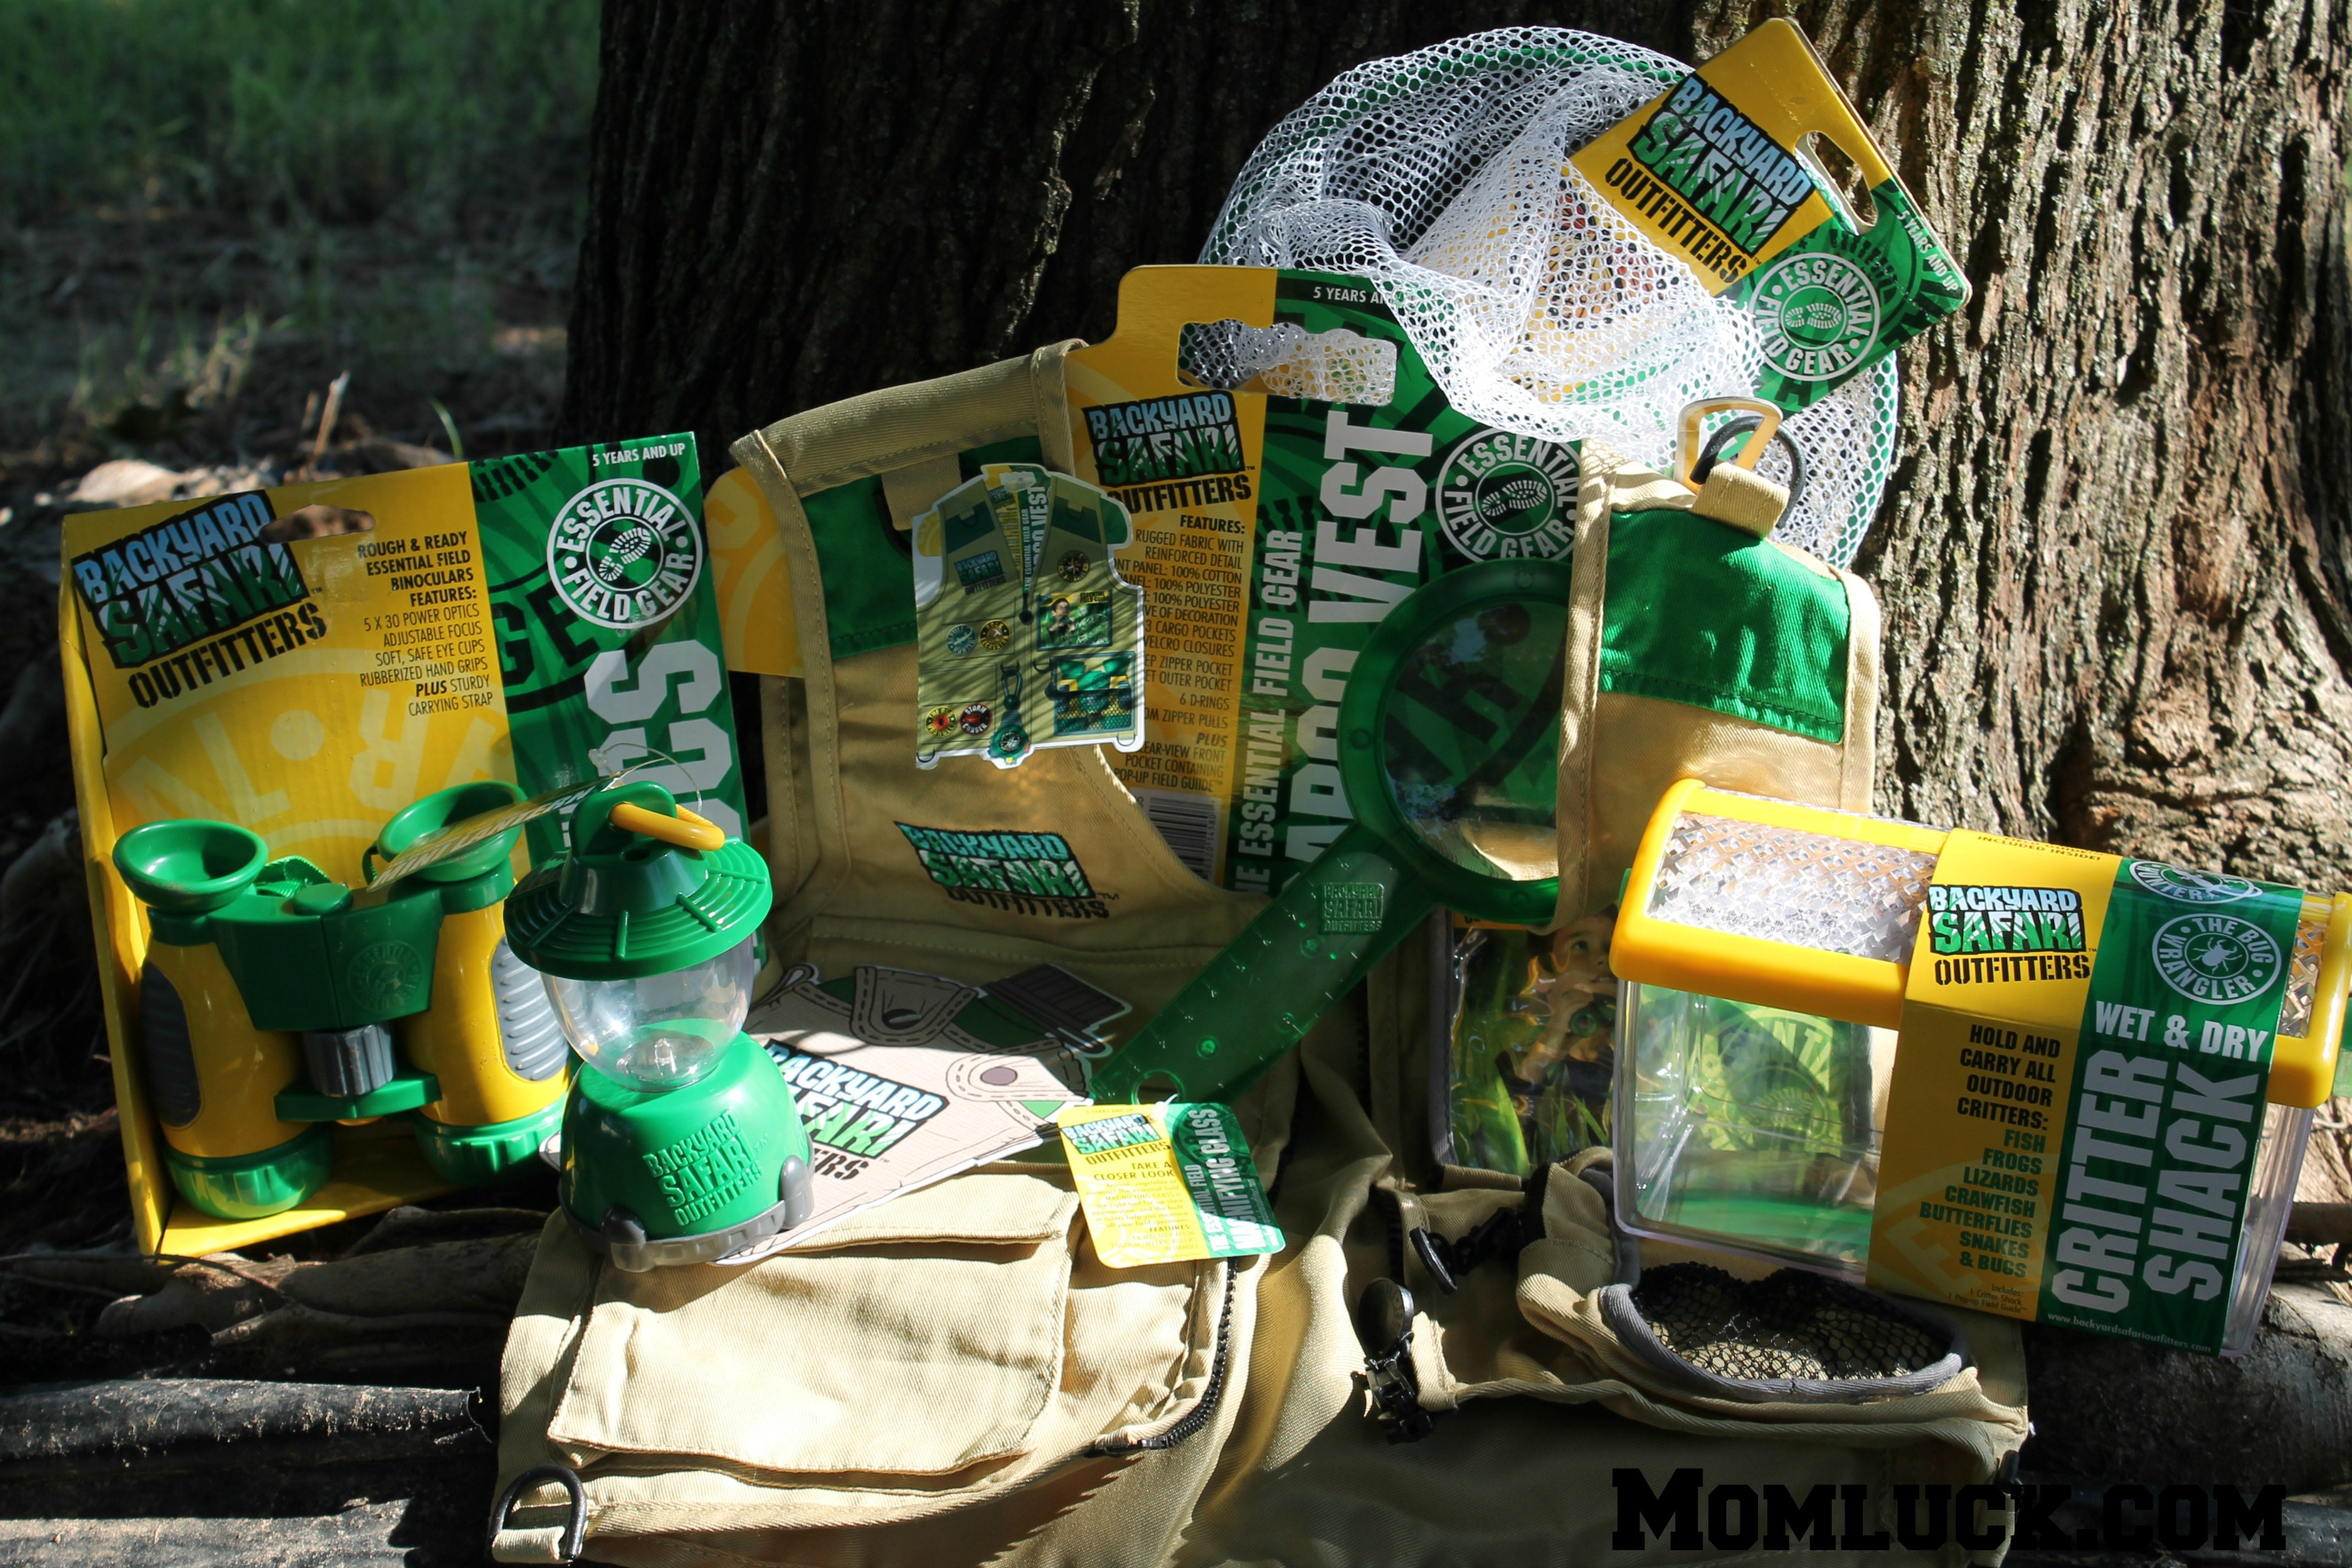 Backyard Safari Toys backyard safari outfitters toys for kids